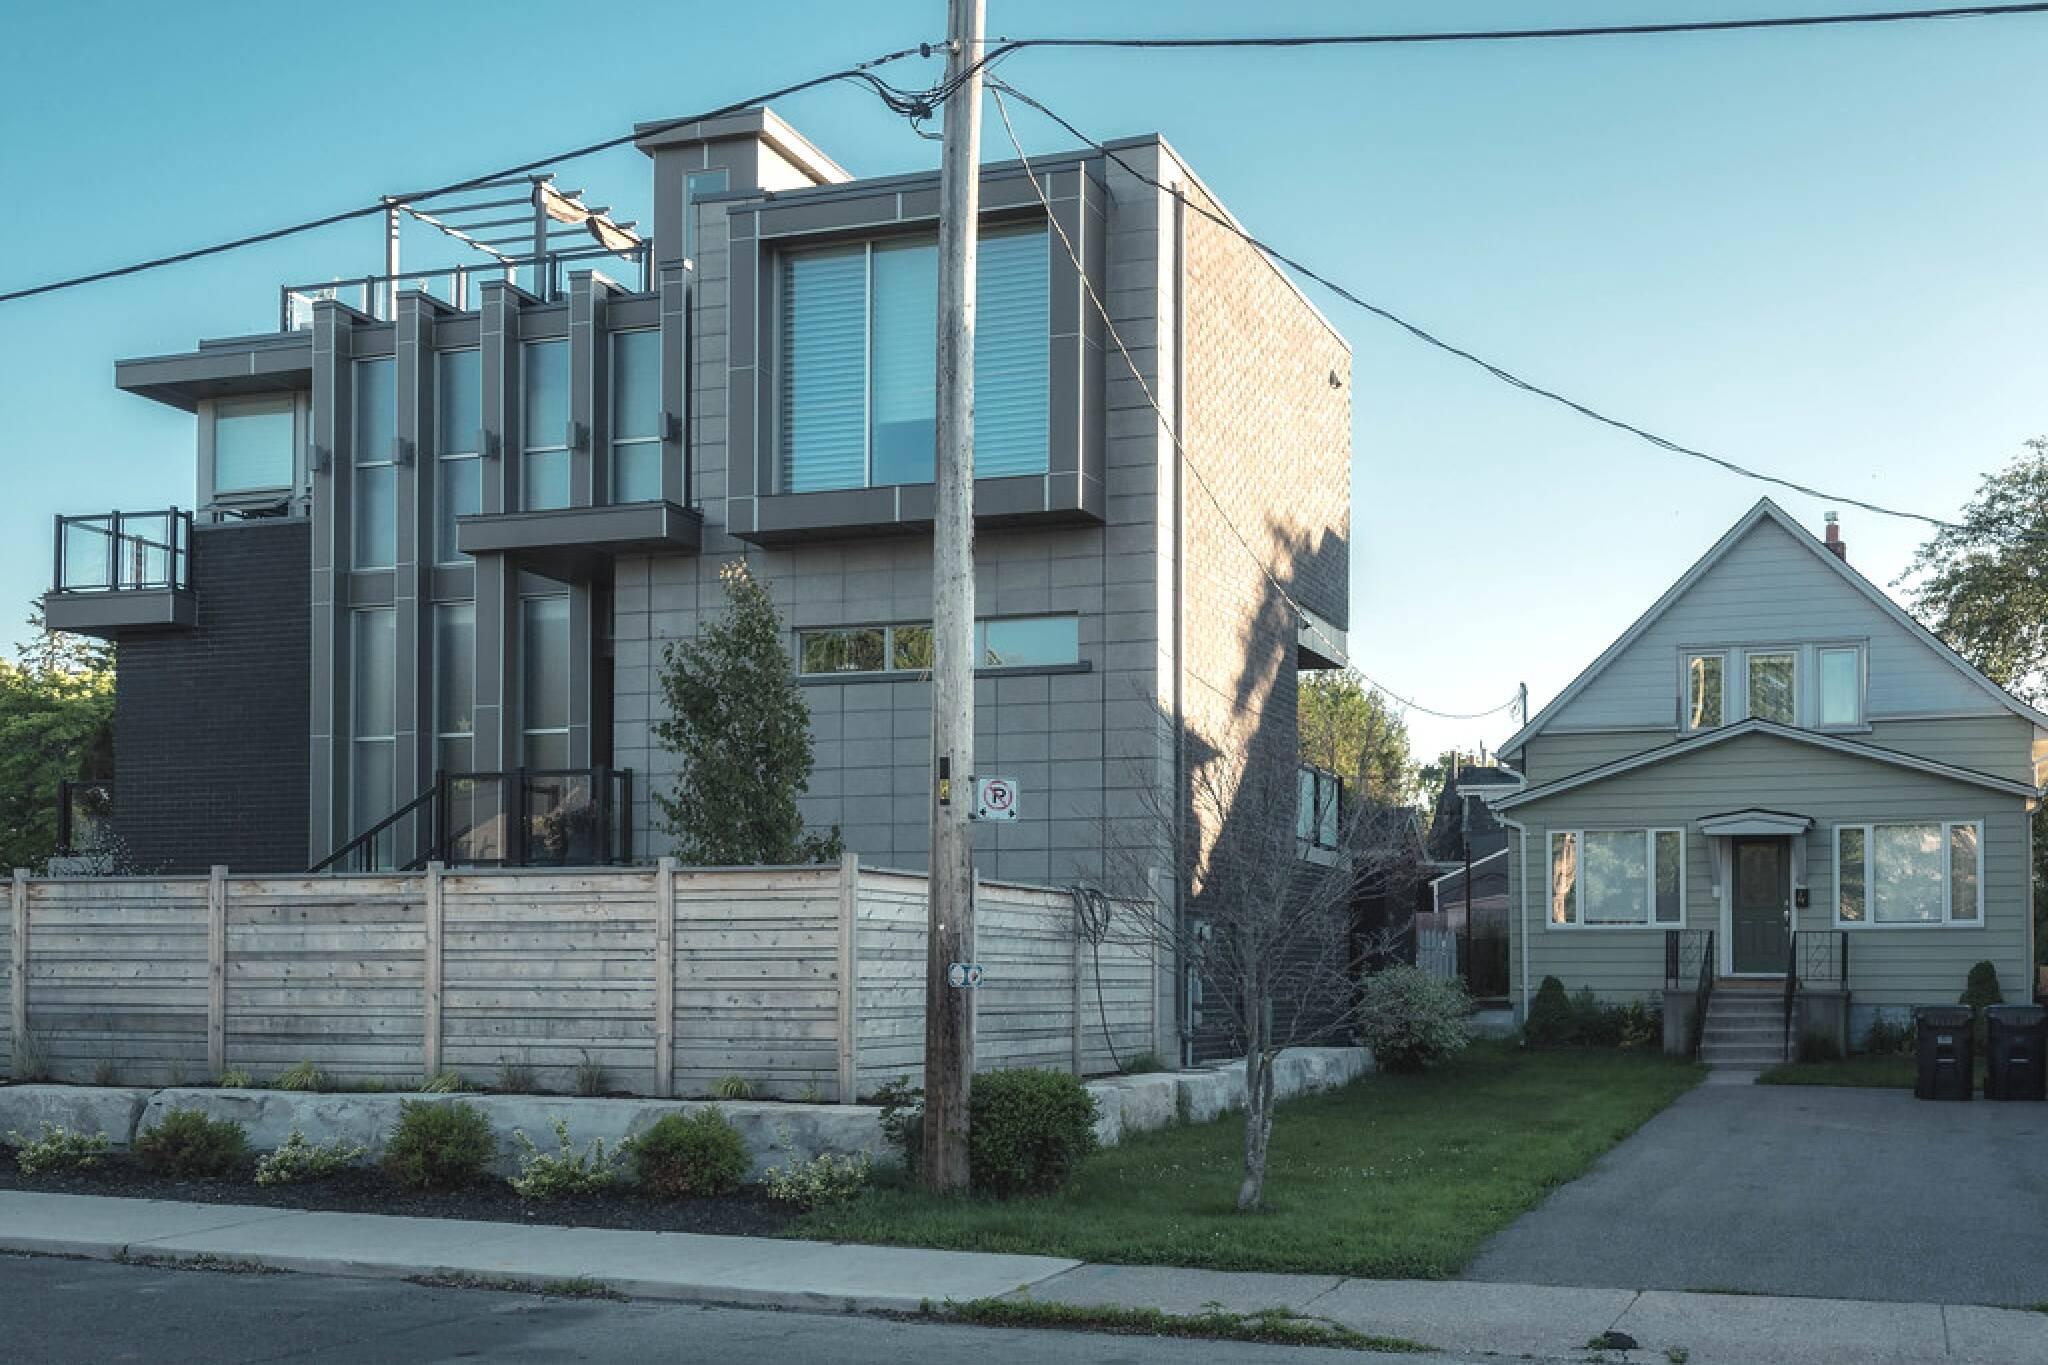 Toronto Regional Real Estate Board President 2020 market outlook